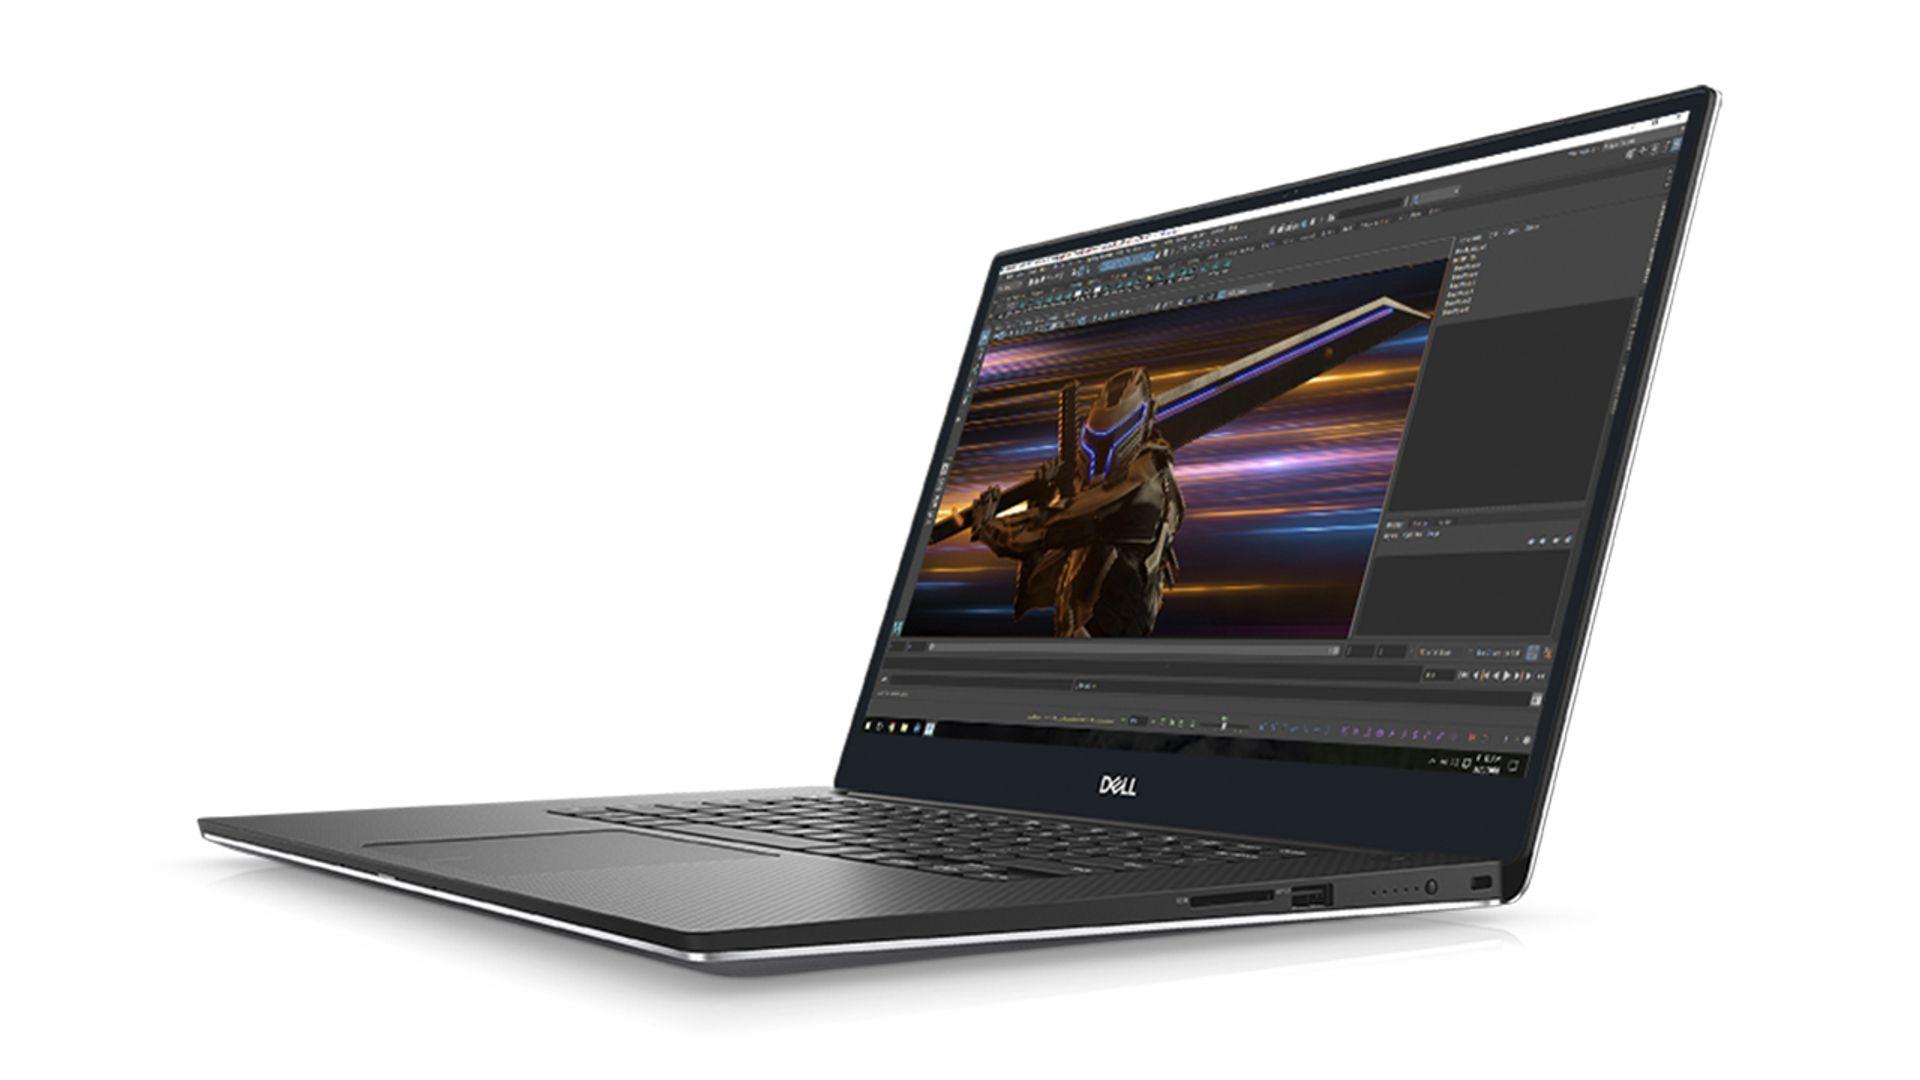 REVIEW: Dell Precision 5540 Mobile Workstation 9